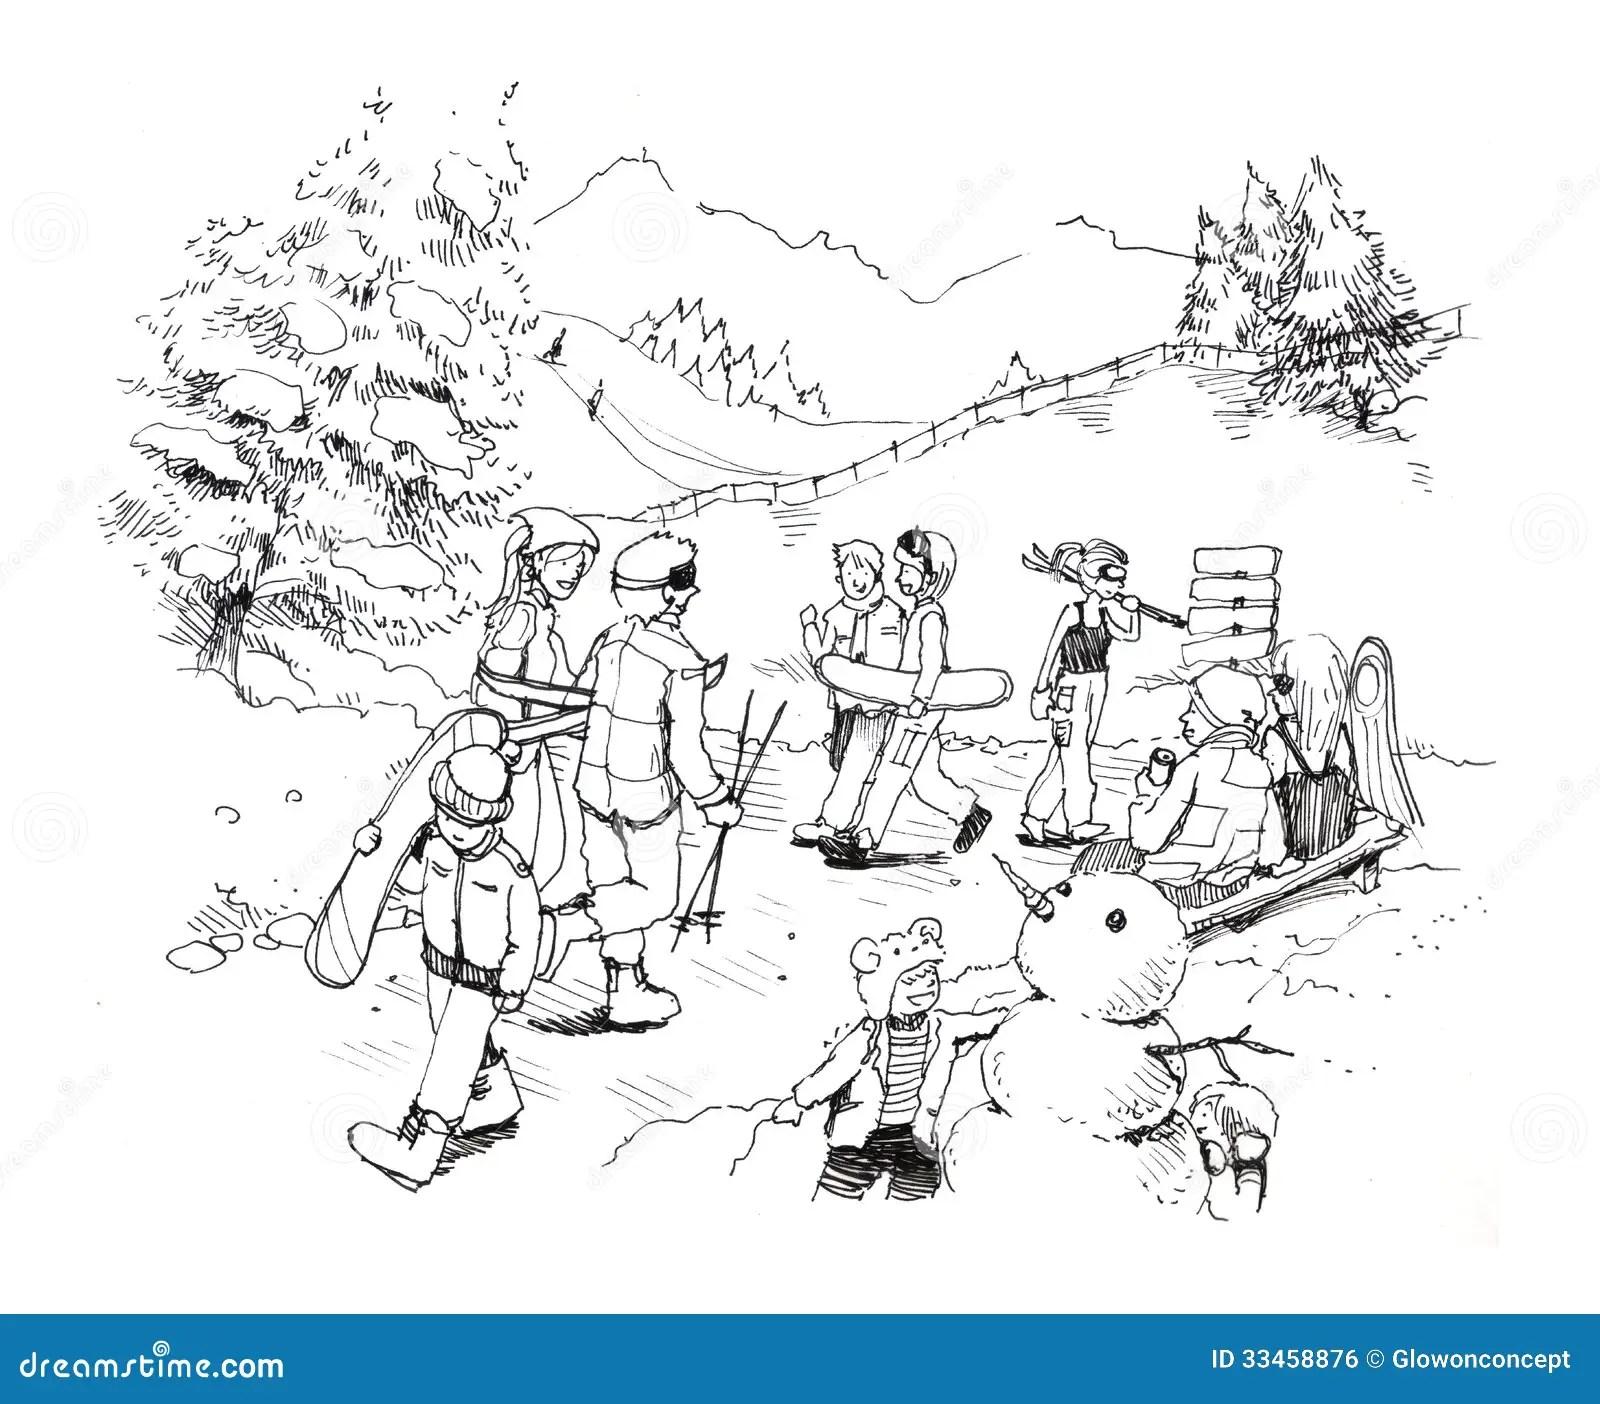 Ski Gondola In Winter Snow Cartoon Drawing Royalty Free